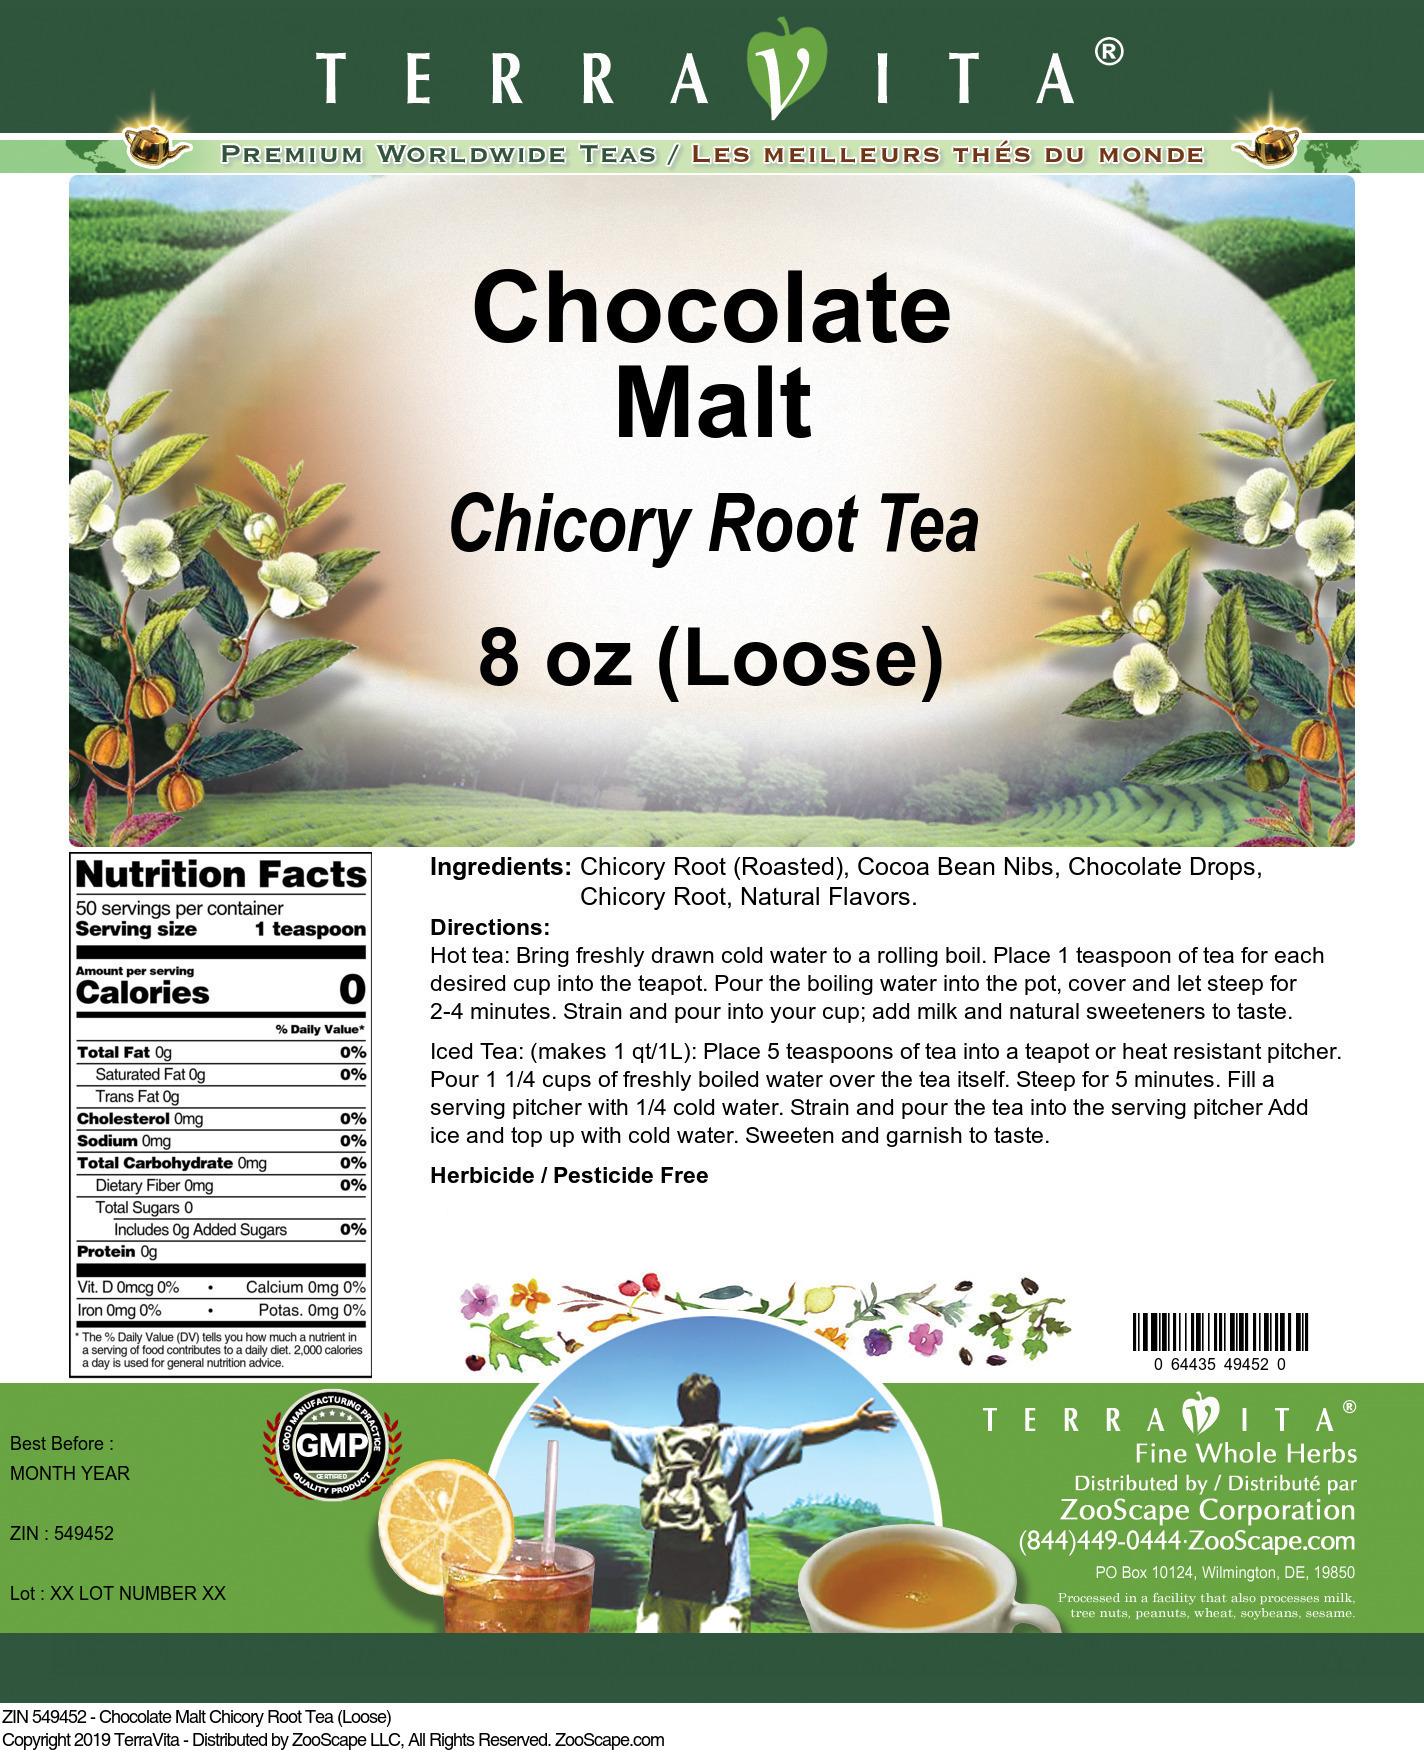 Chocolate Malt Chicory Root Tea (Loose)